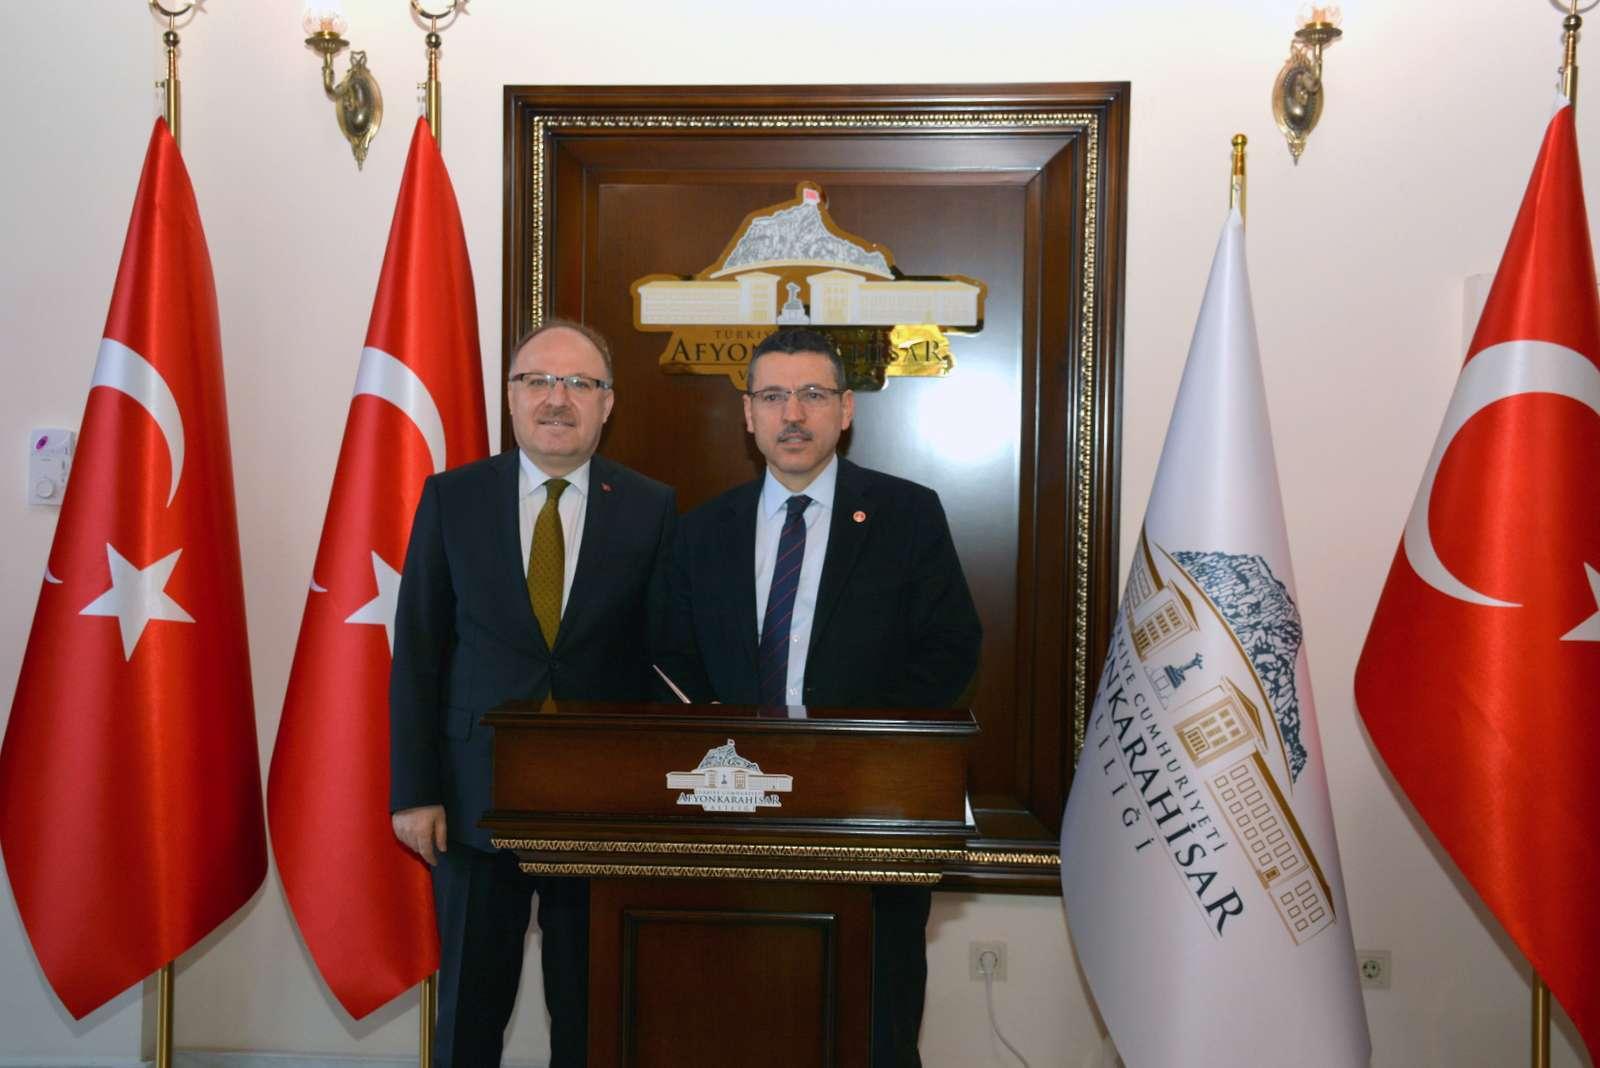 Sayıştay Başkanı Seyit Ahmet Baş Vali Mustafa Tutulmaz'ı Makamında ziyaret etti